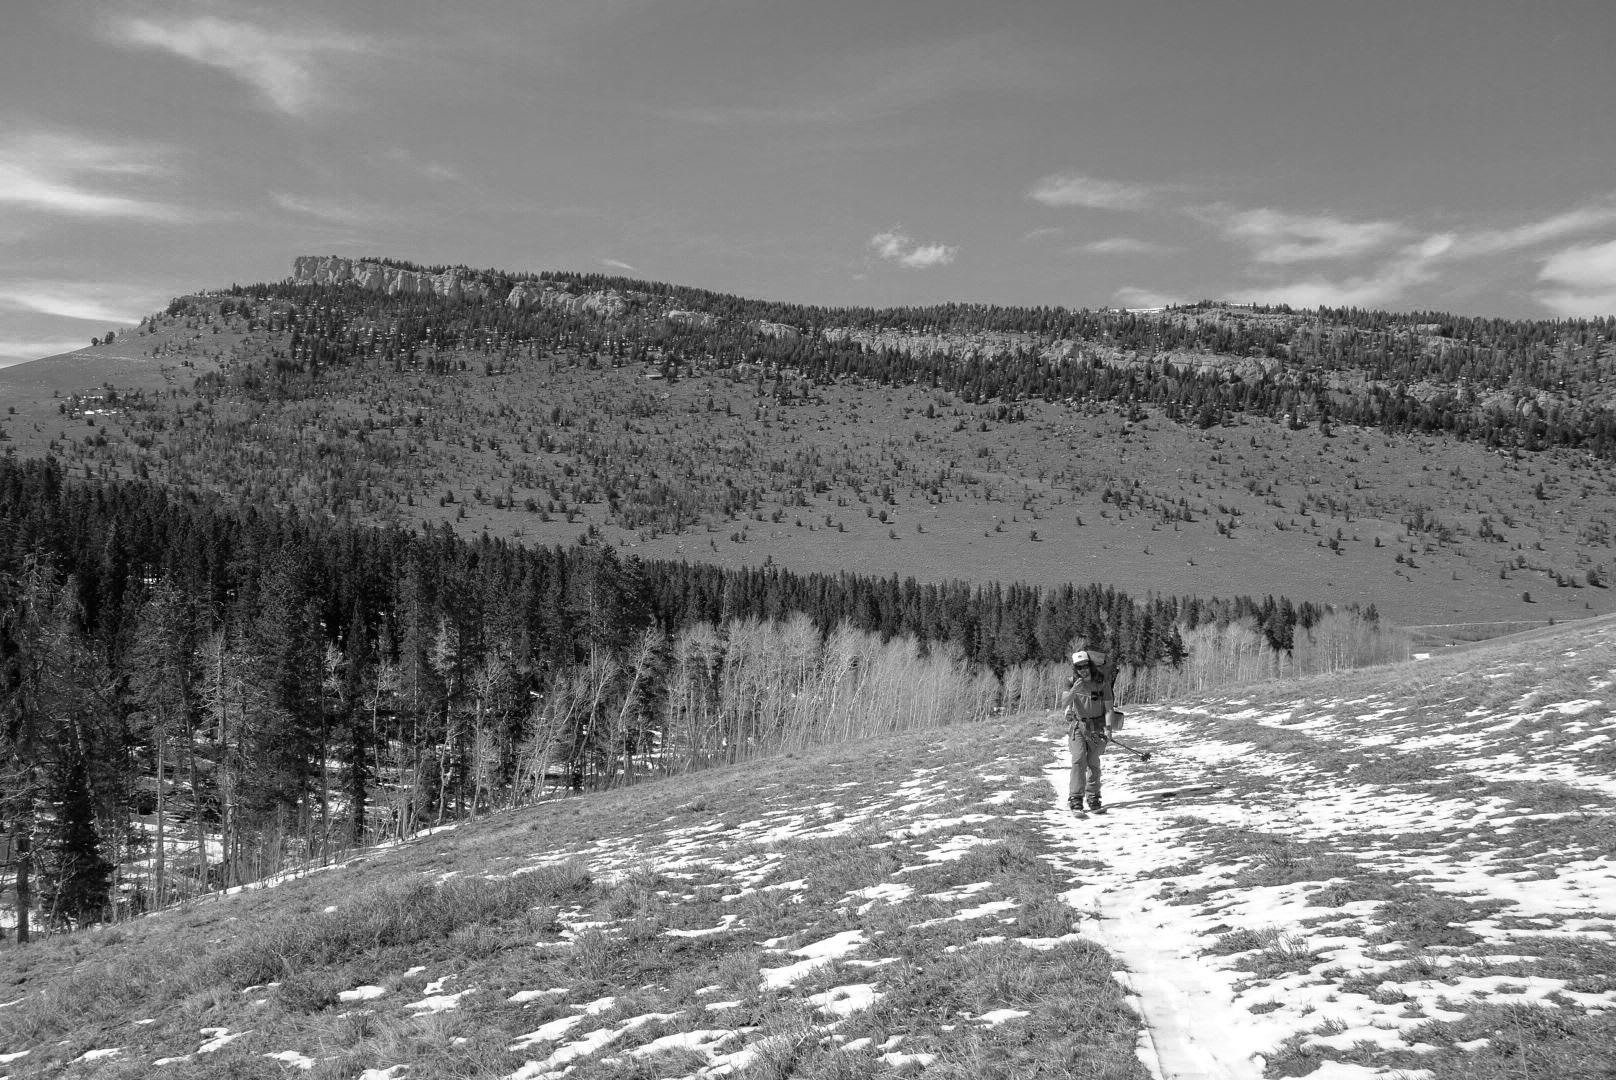 Exploring the Greater Yellowstone Area via Splitboard approach zach bw